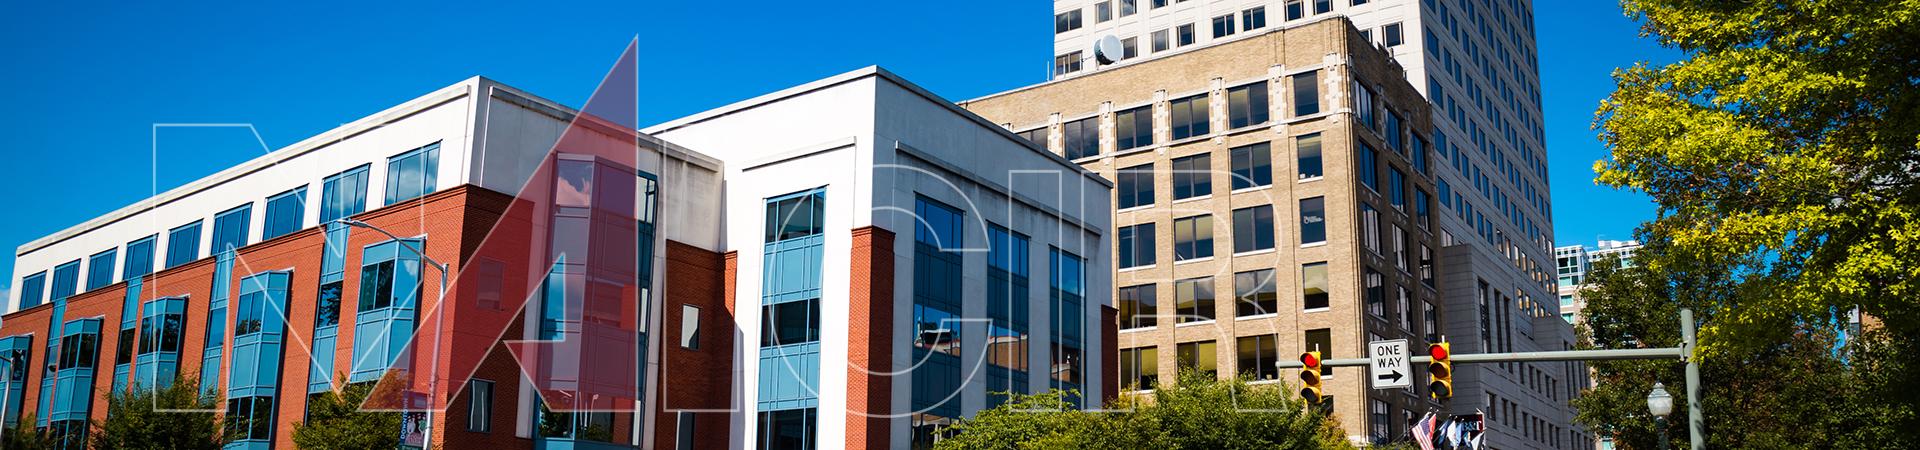 NAI CIR Office Buildings